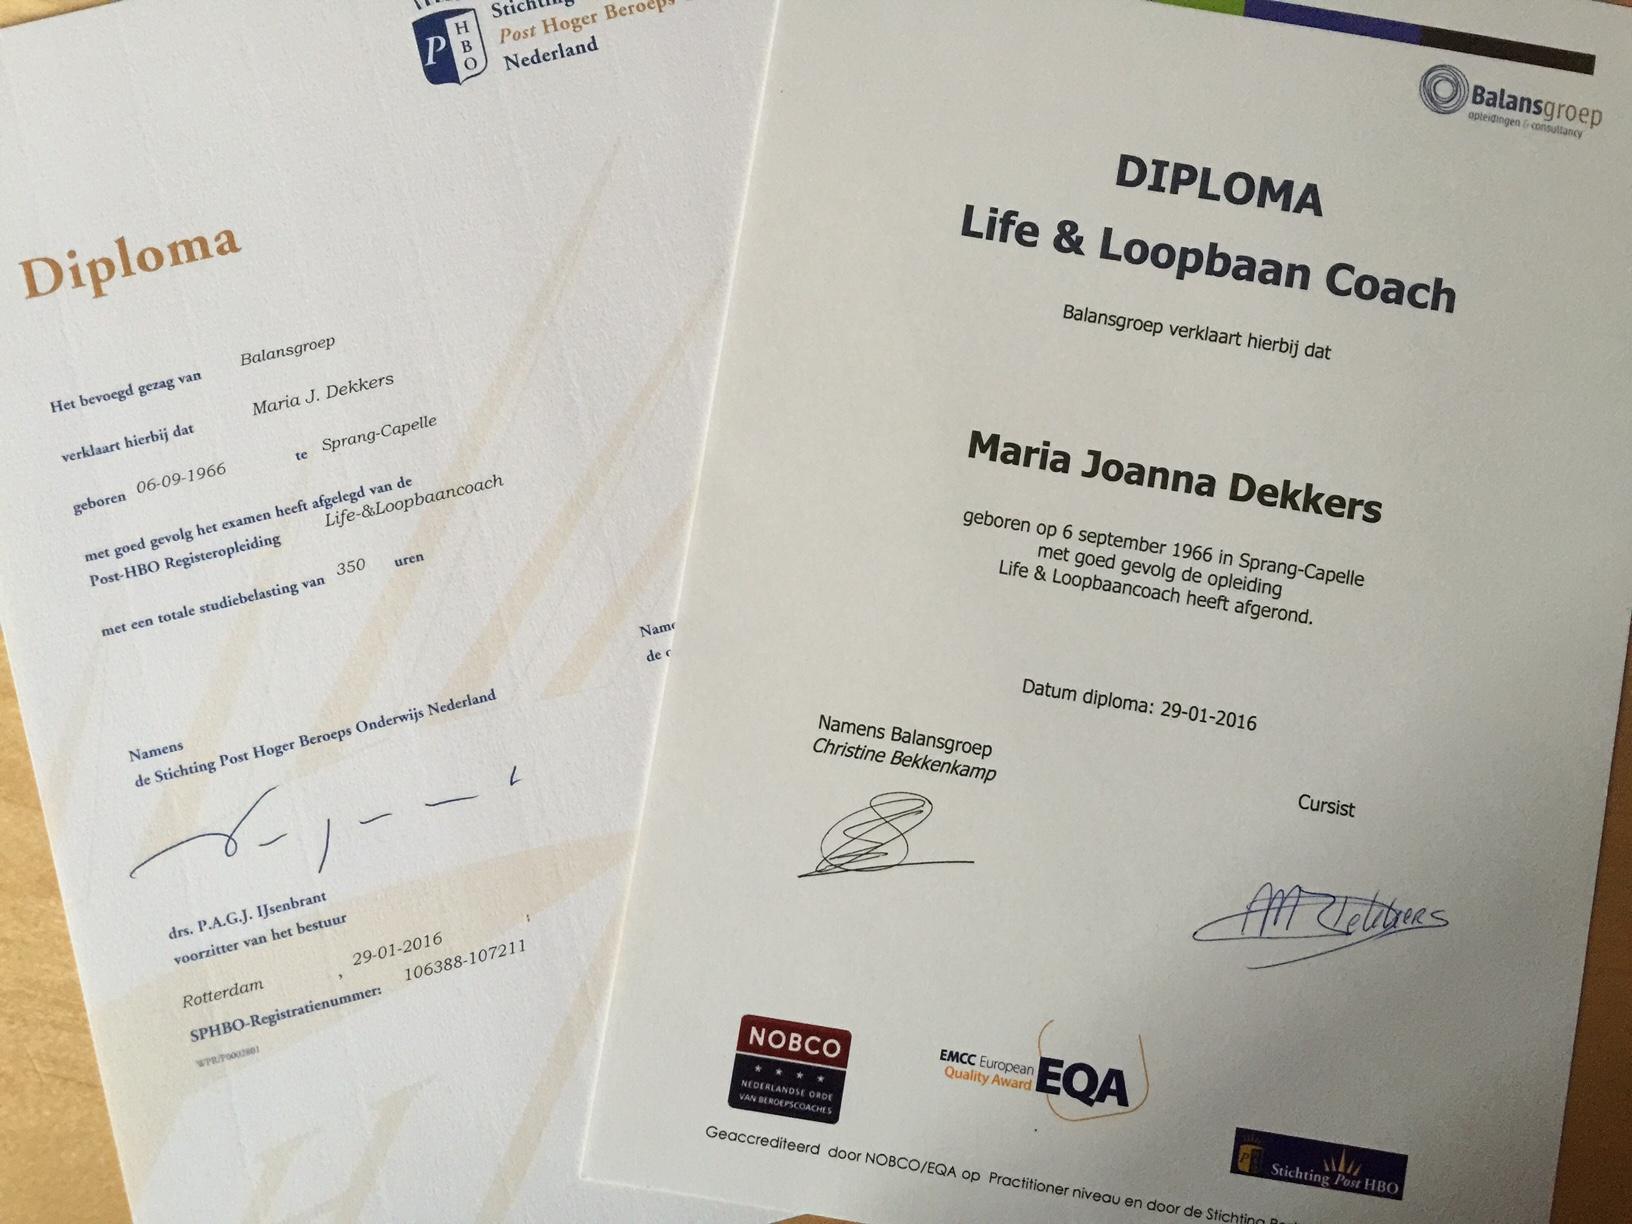 diploma life- & loopbaancoach